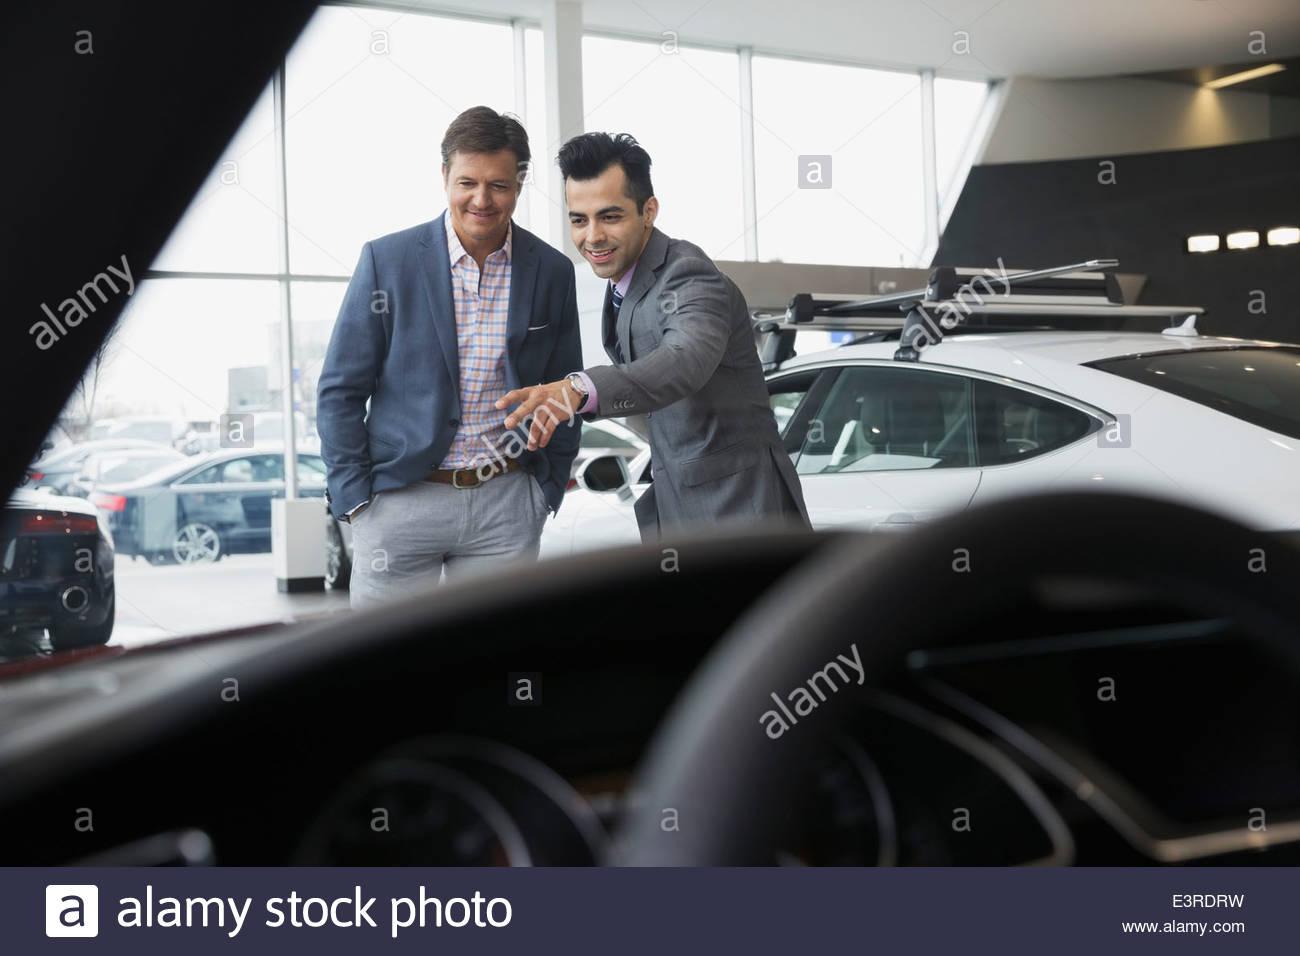 Salesman talking to man in car dealership showroom - Stock Image